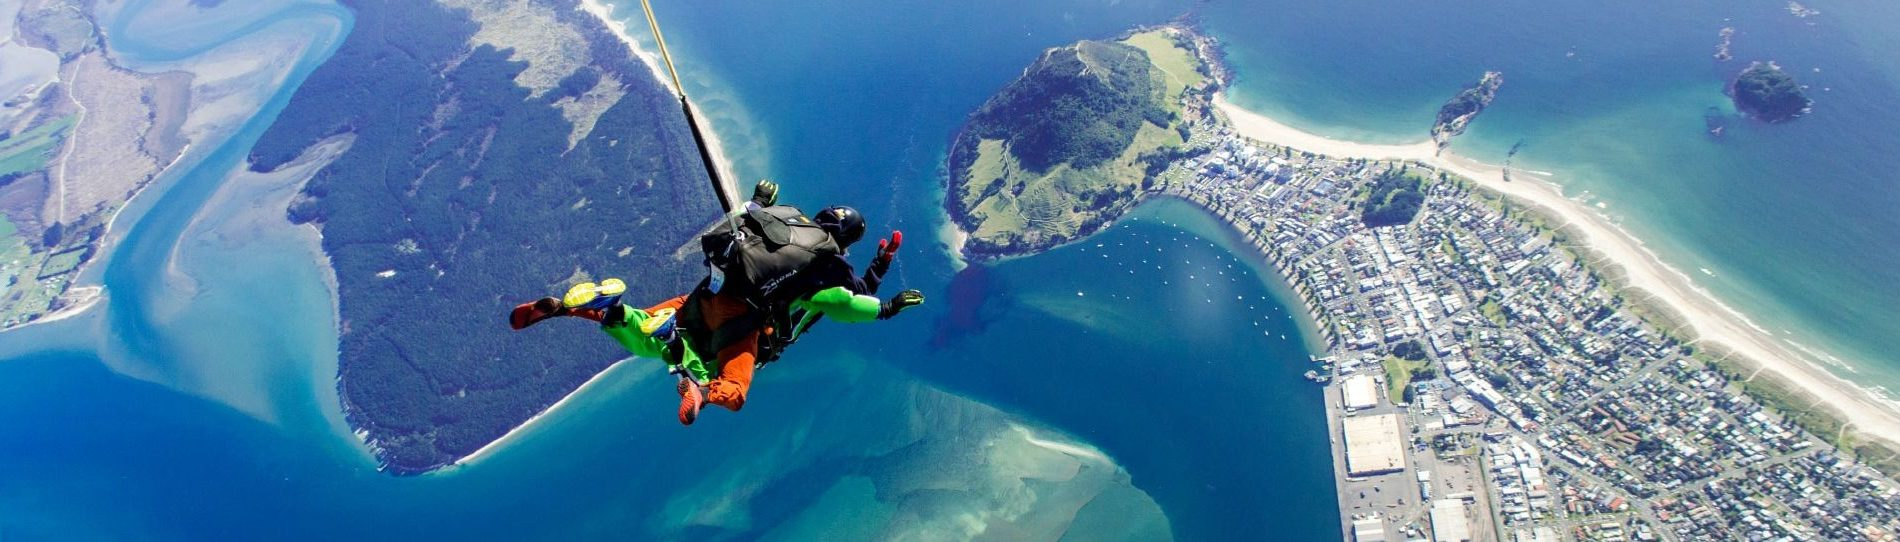 tauranga bucks skydive